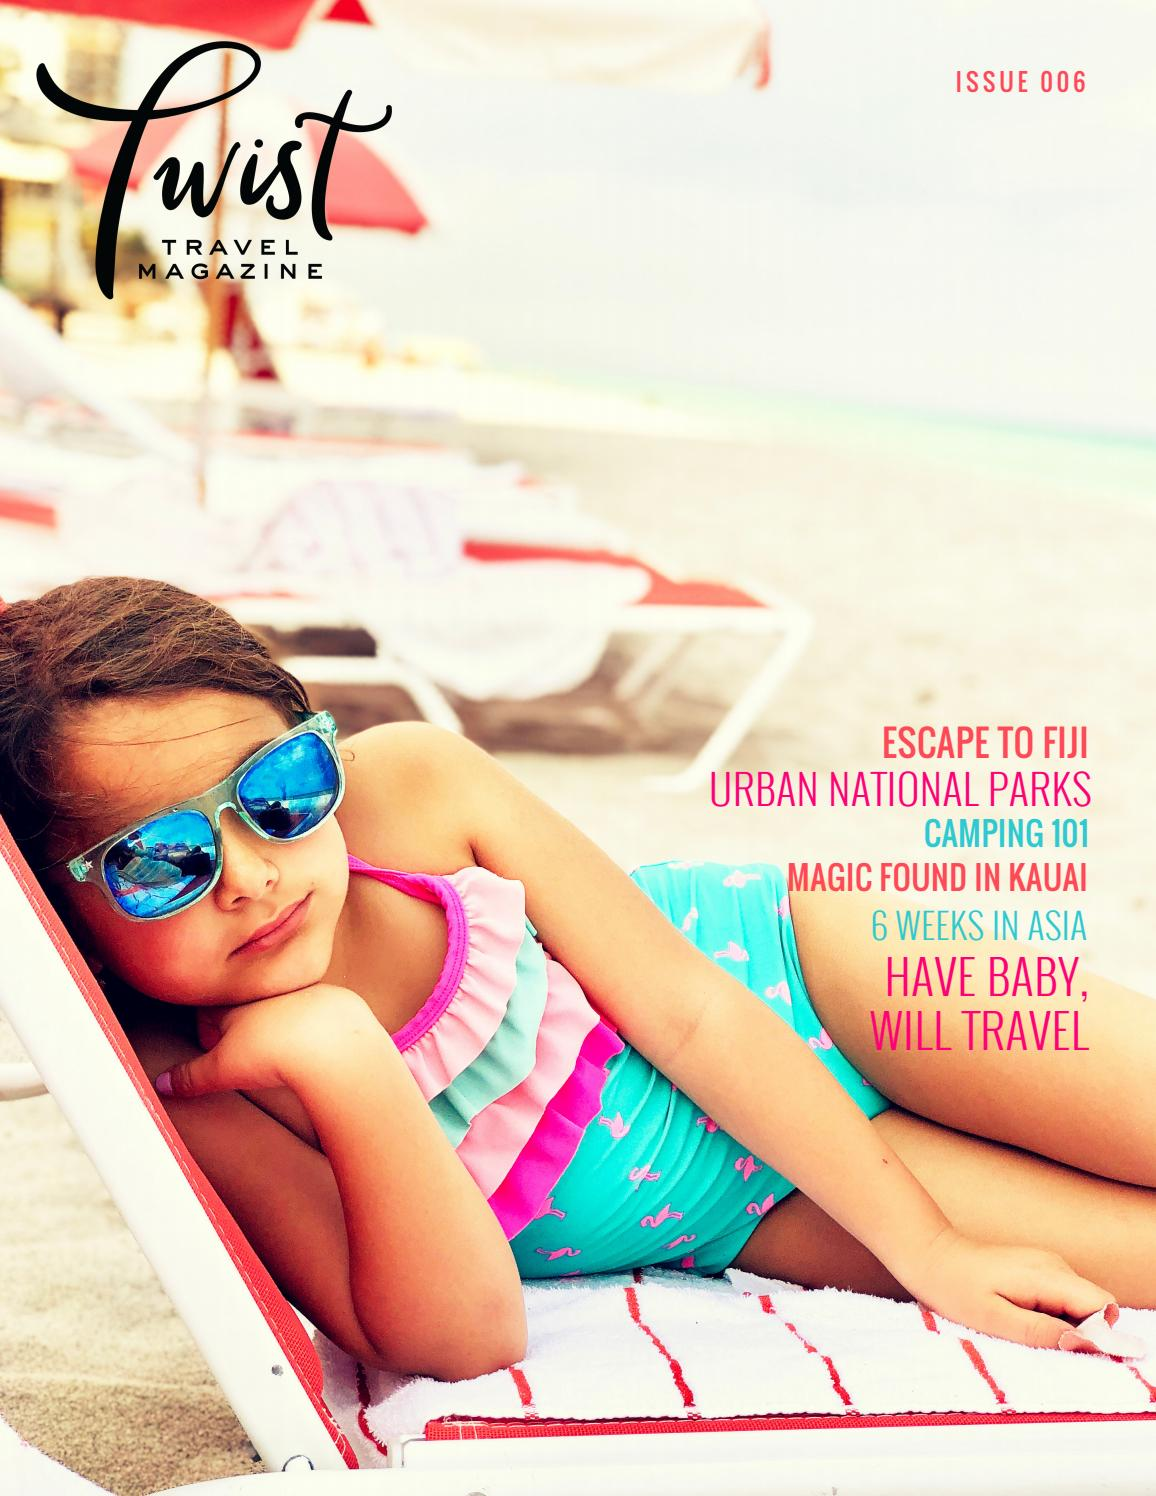 49e5f2a674 Twist Travel Magazine Issue 006 by Twist Travel Magazine - issuu